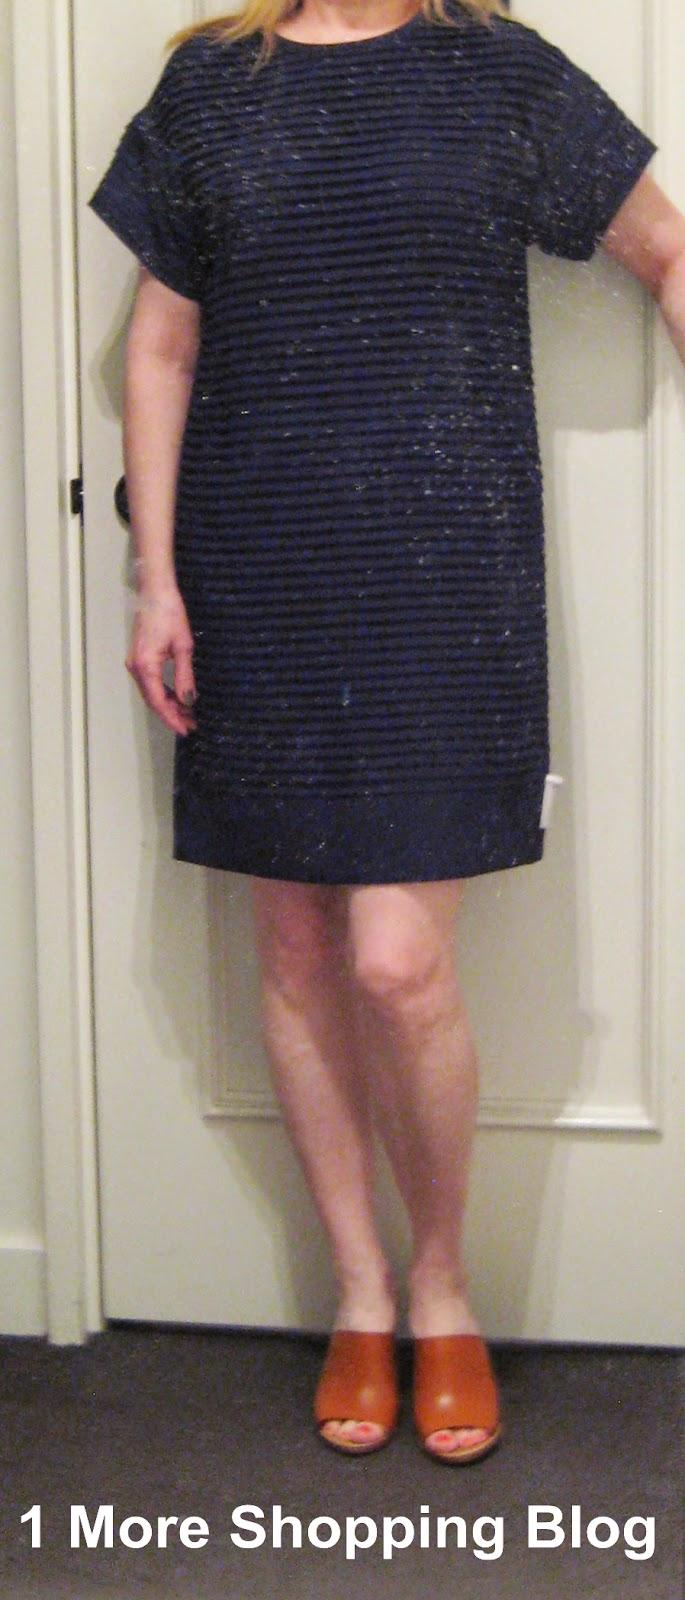 pleated chiffon tshirt dress similar here here here marlow mules similar here here here